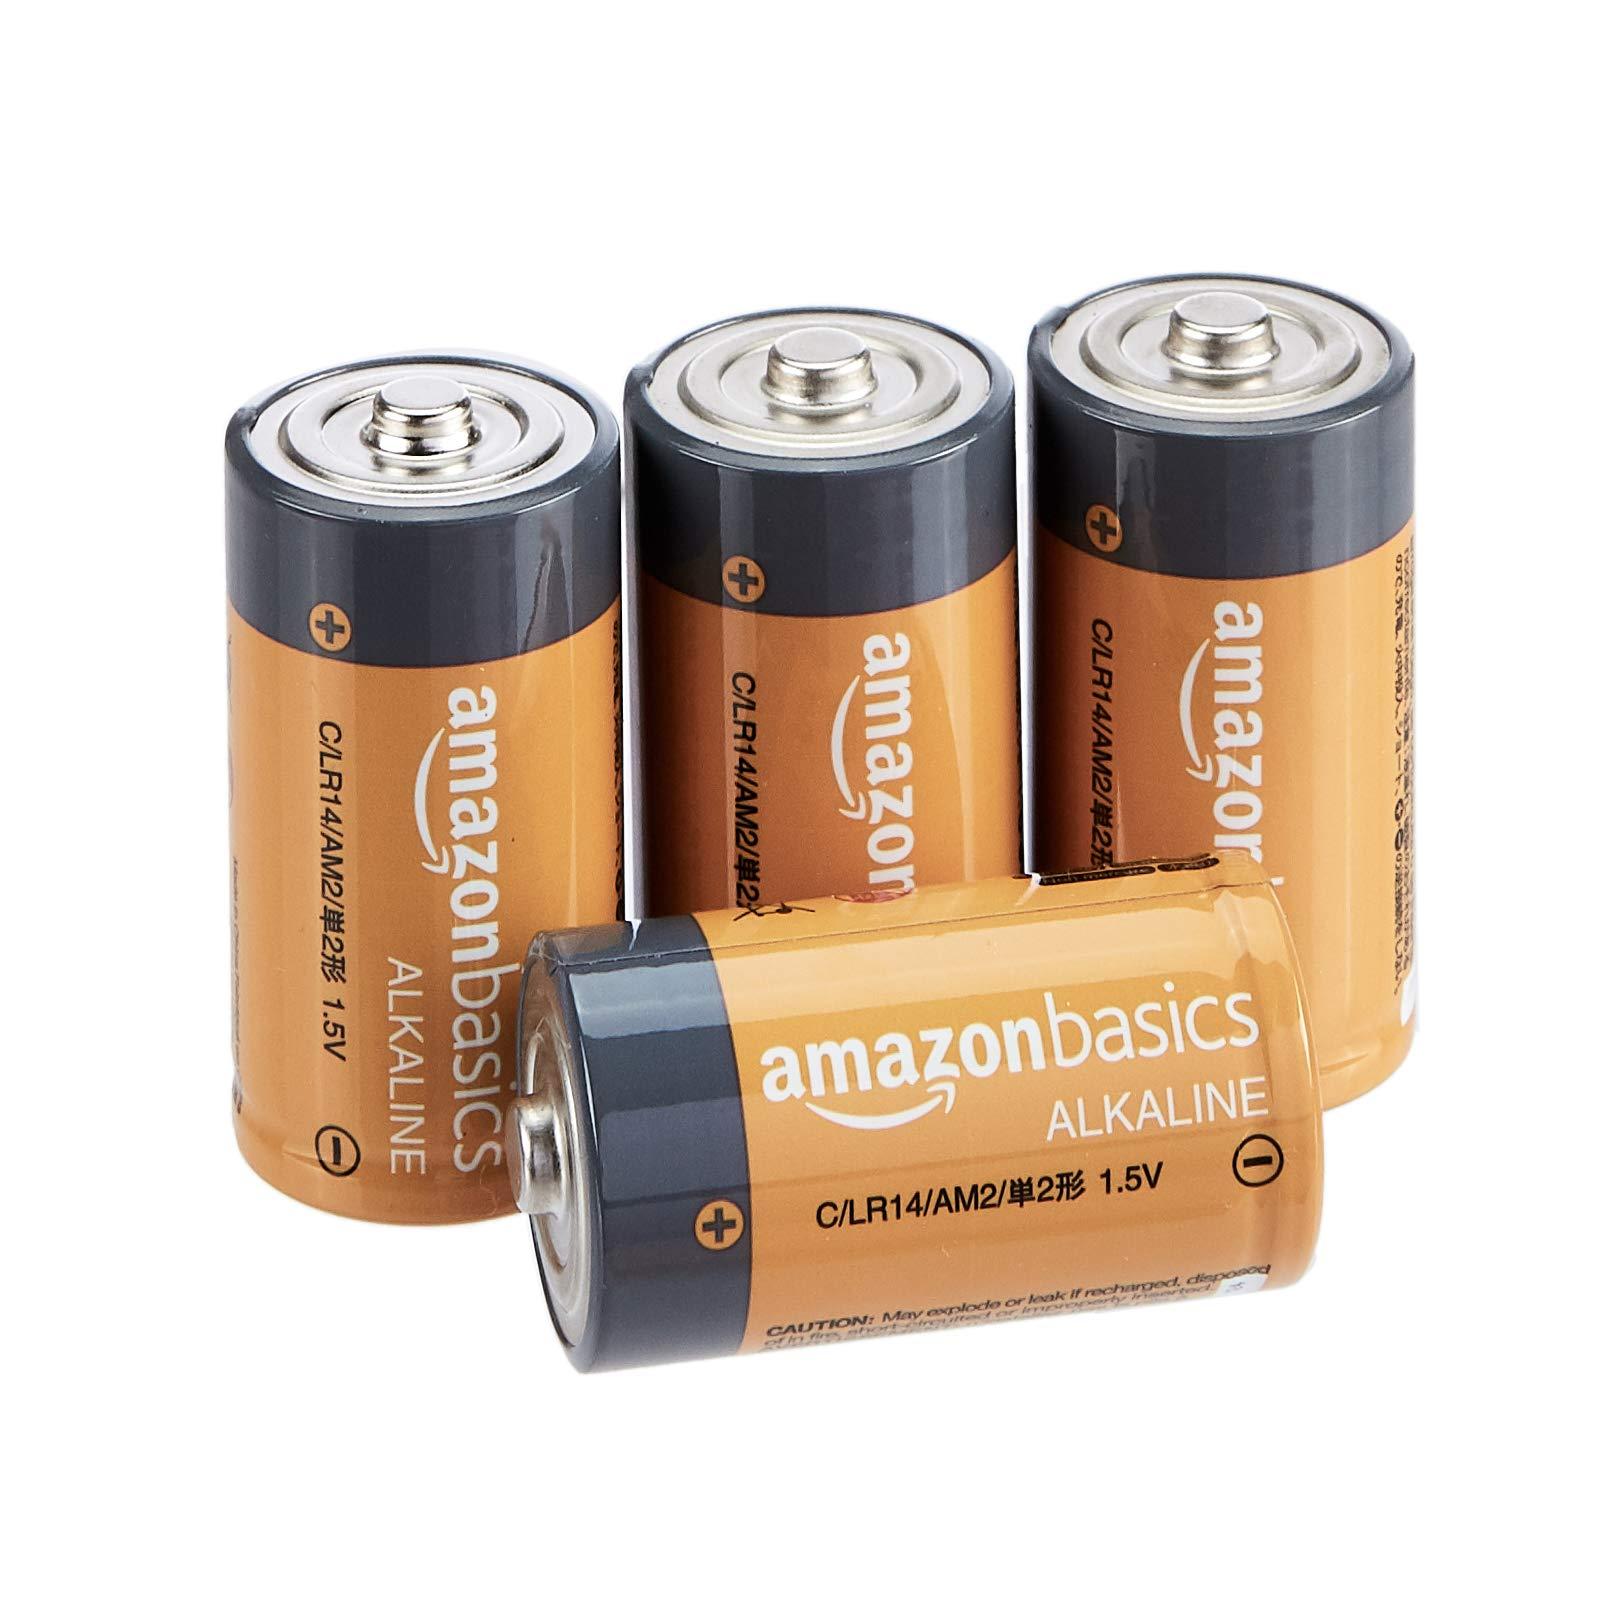 AmazonBasics Everyday Alkaline Batteries 4 Pack